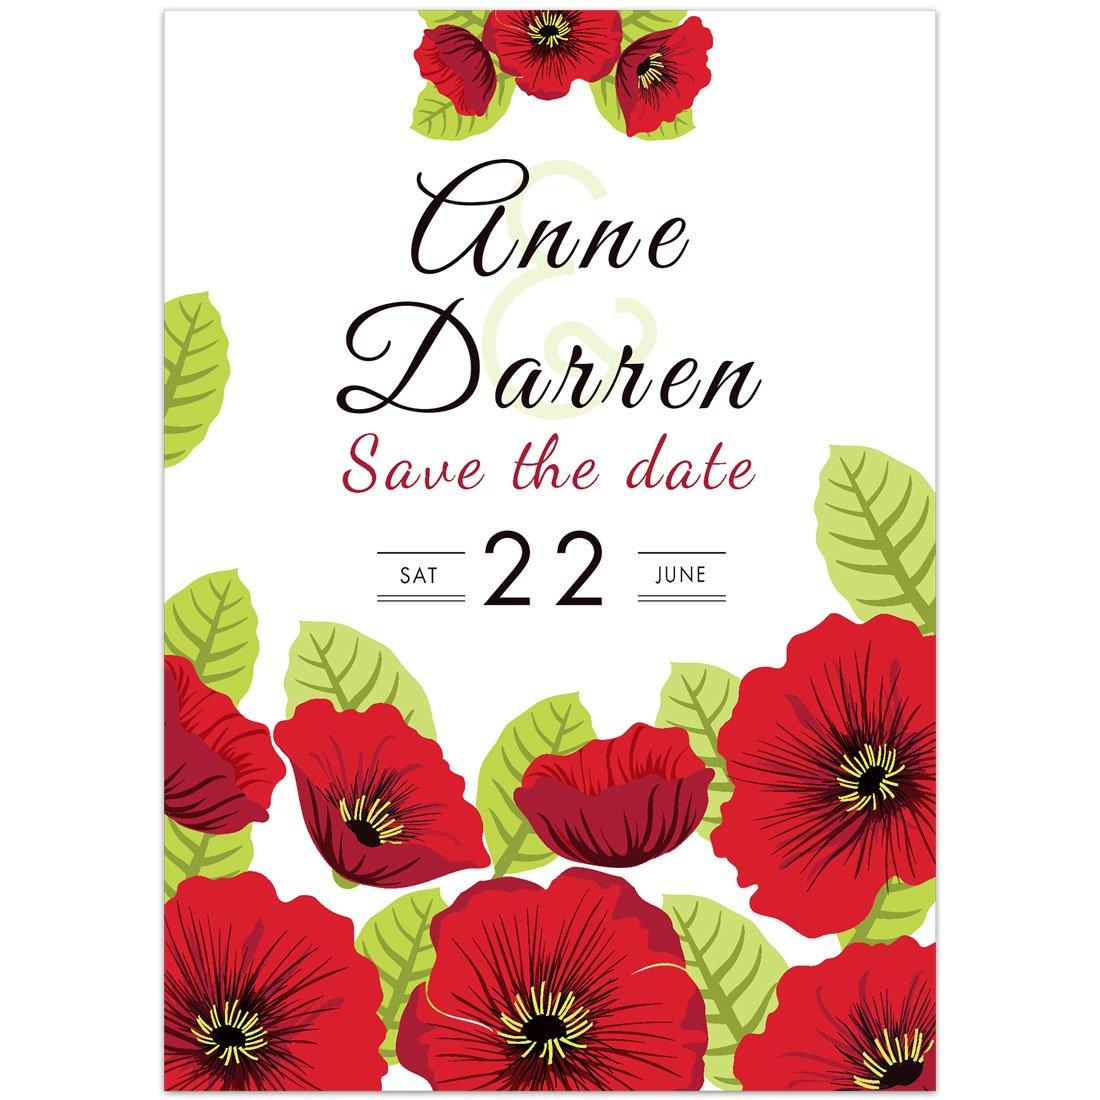 Amazon.com: Red Flowers Save the Date Card Wedding Invitation: Handmade